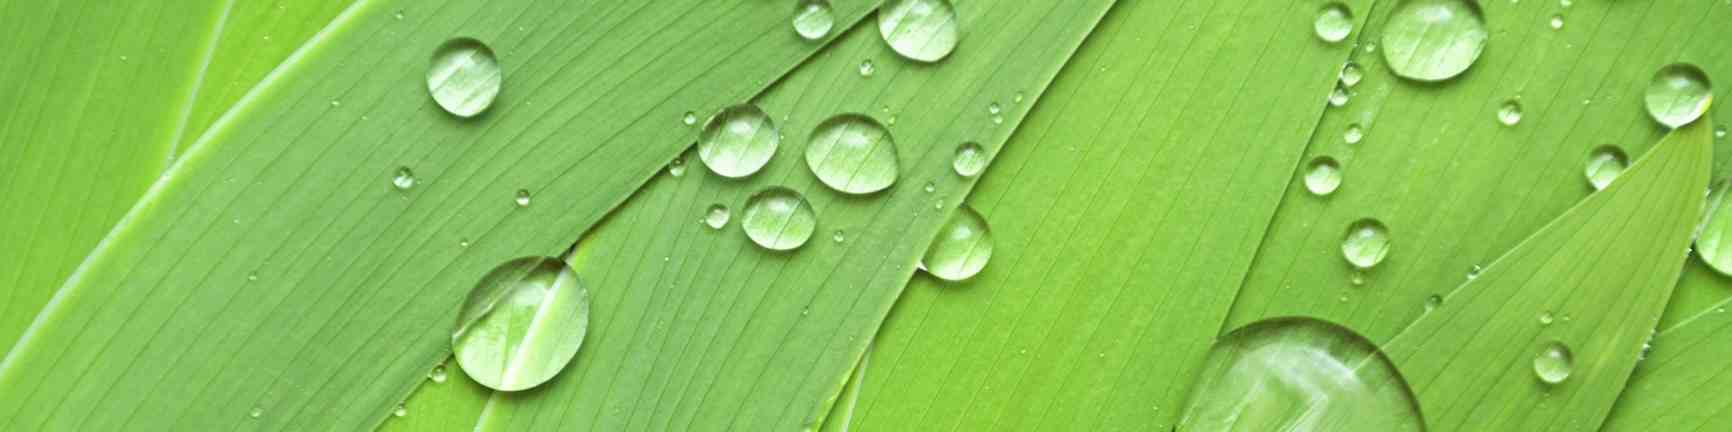 Eutonie-feuilles